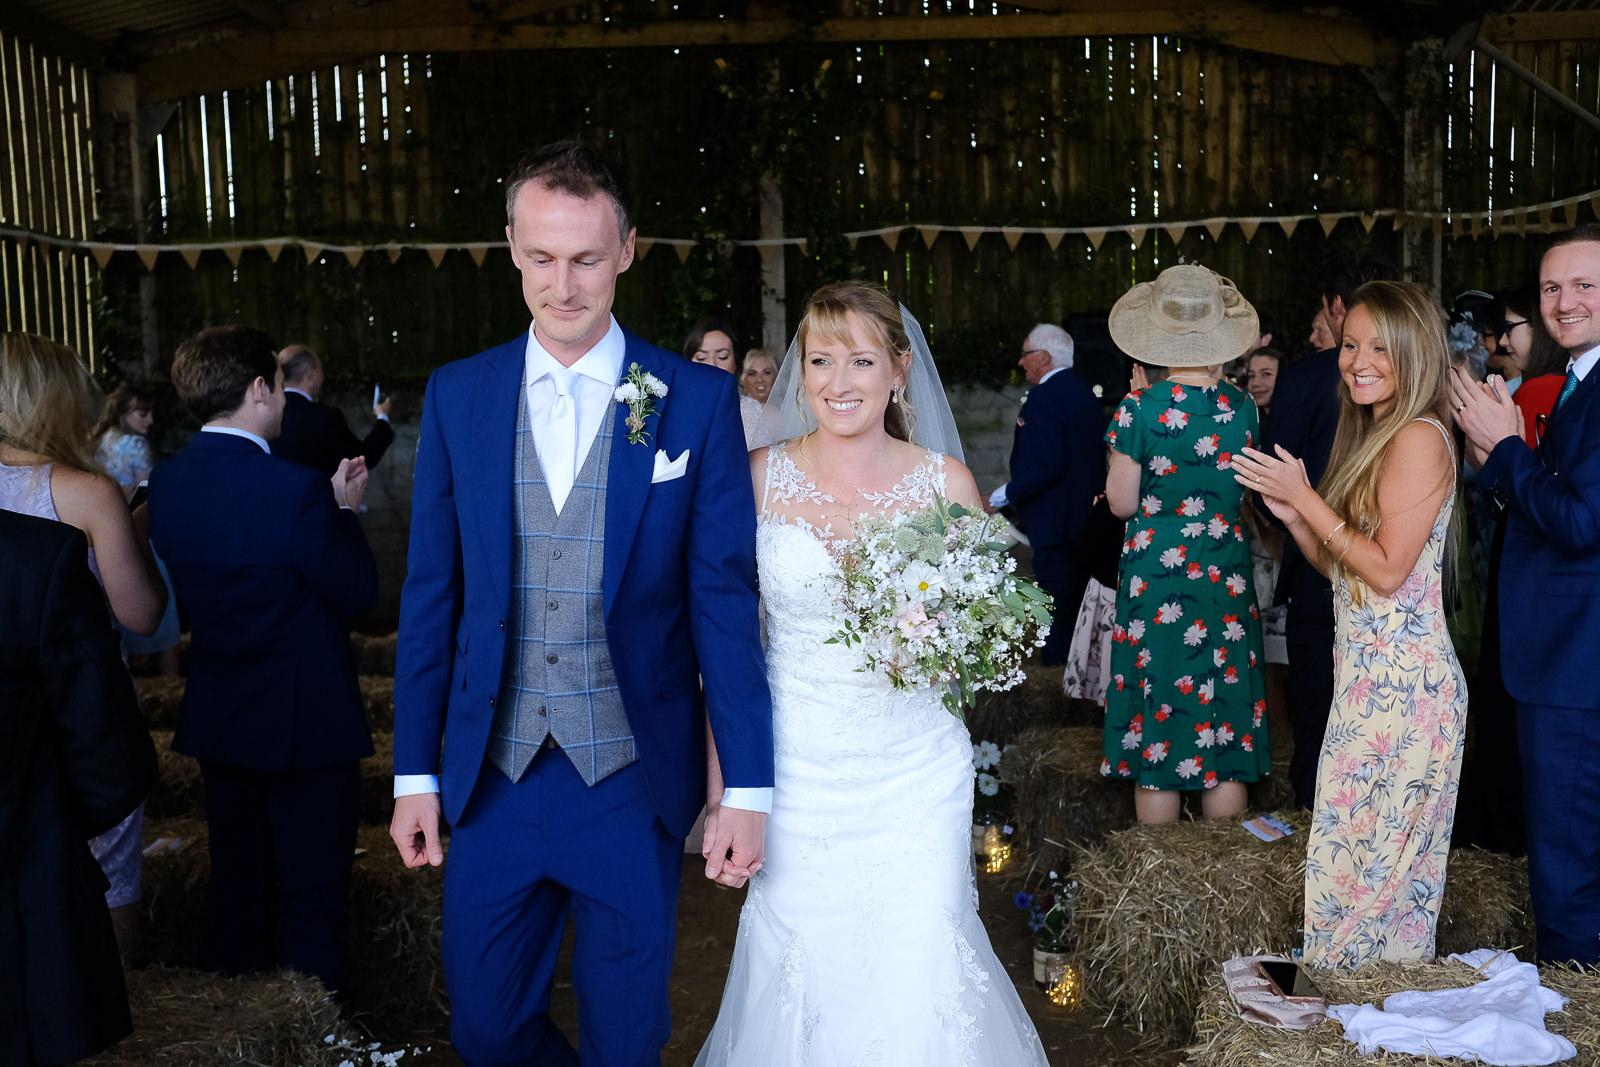 Roscarrock Farm wedding in Cornwall 036.jpg